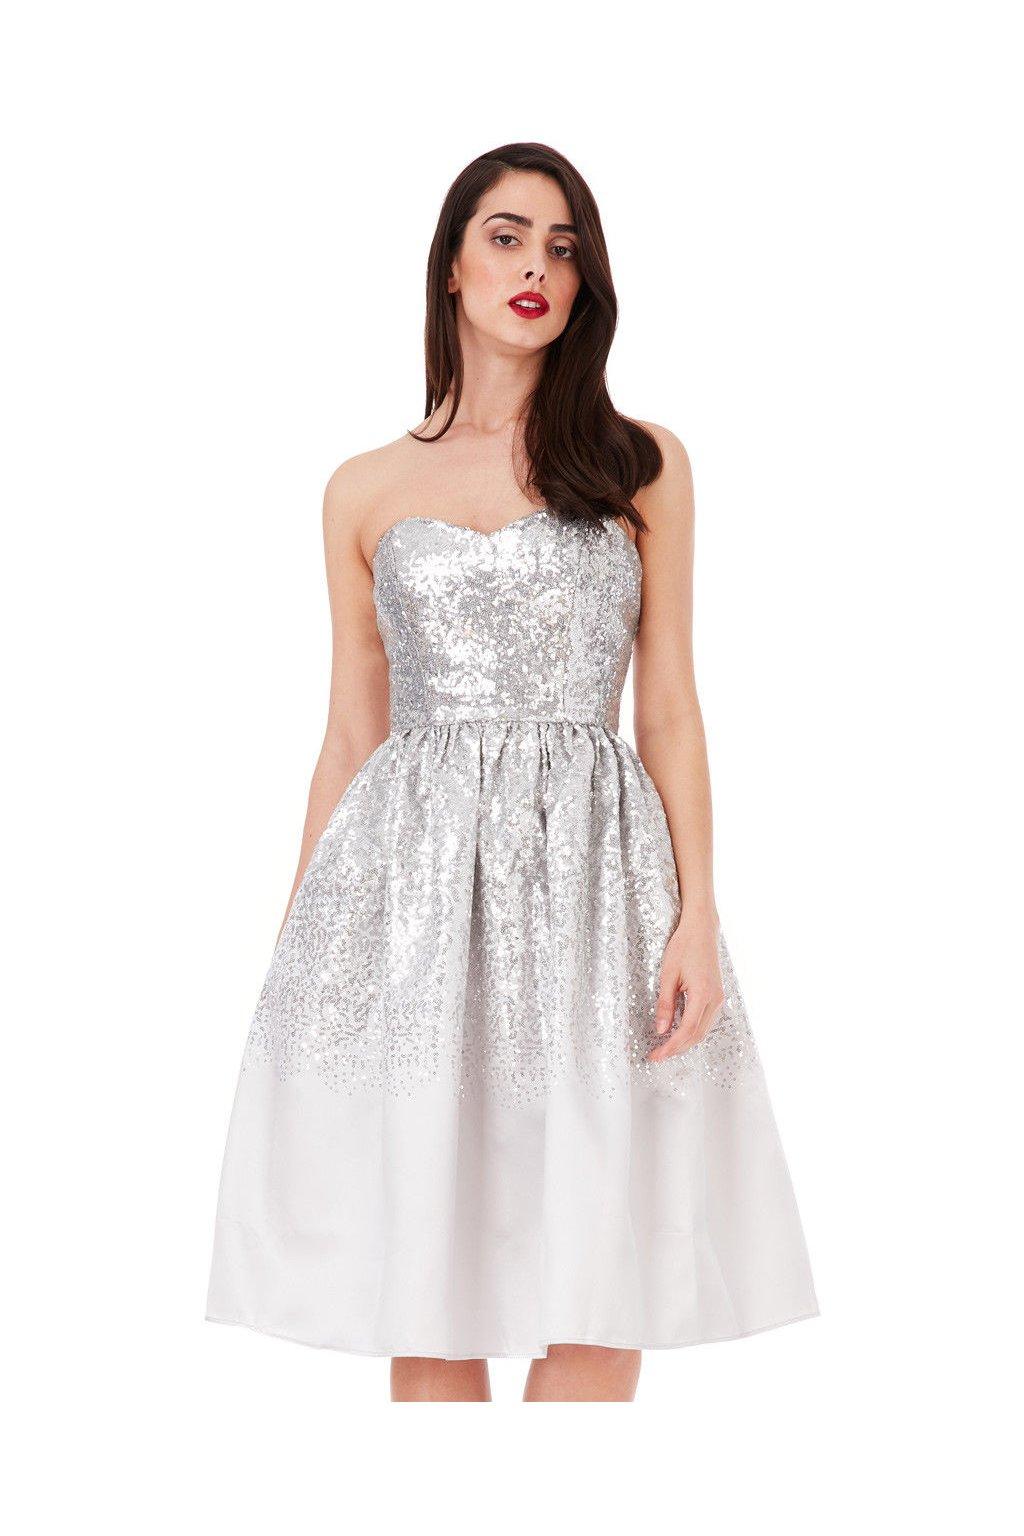 Stříbrné koktejlové šaty Goddiva skladem - Bestmoda cb417d9cd93